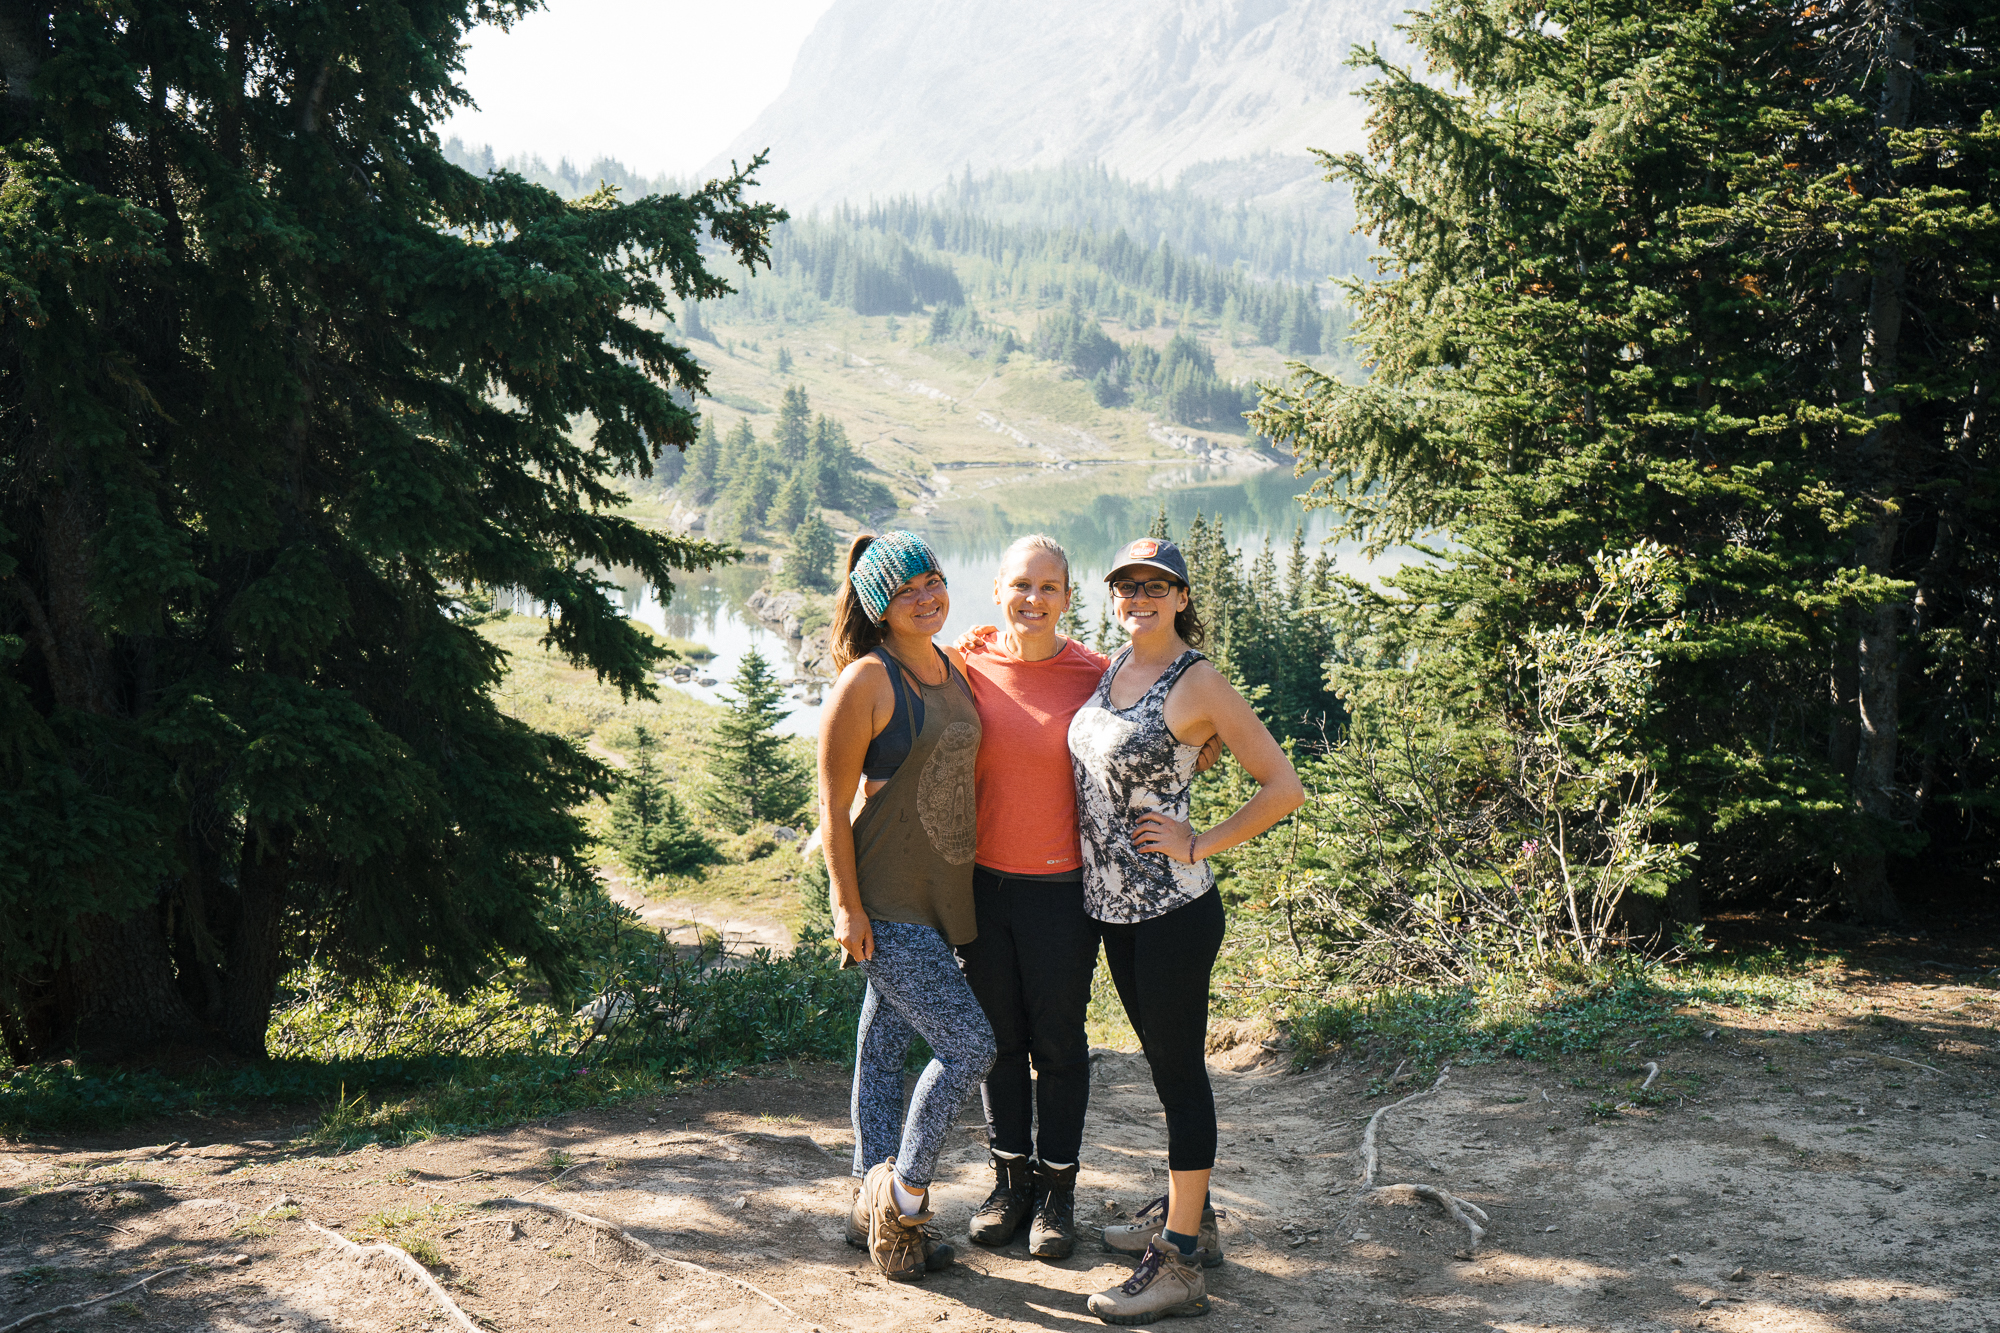 Banff-03588.jpg